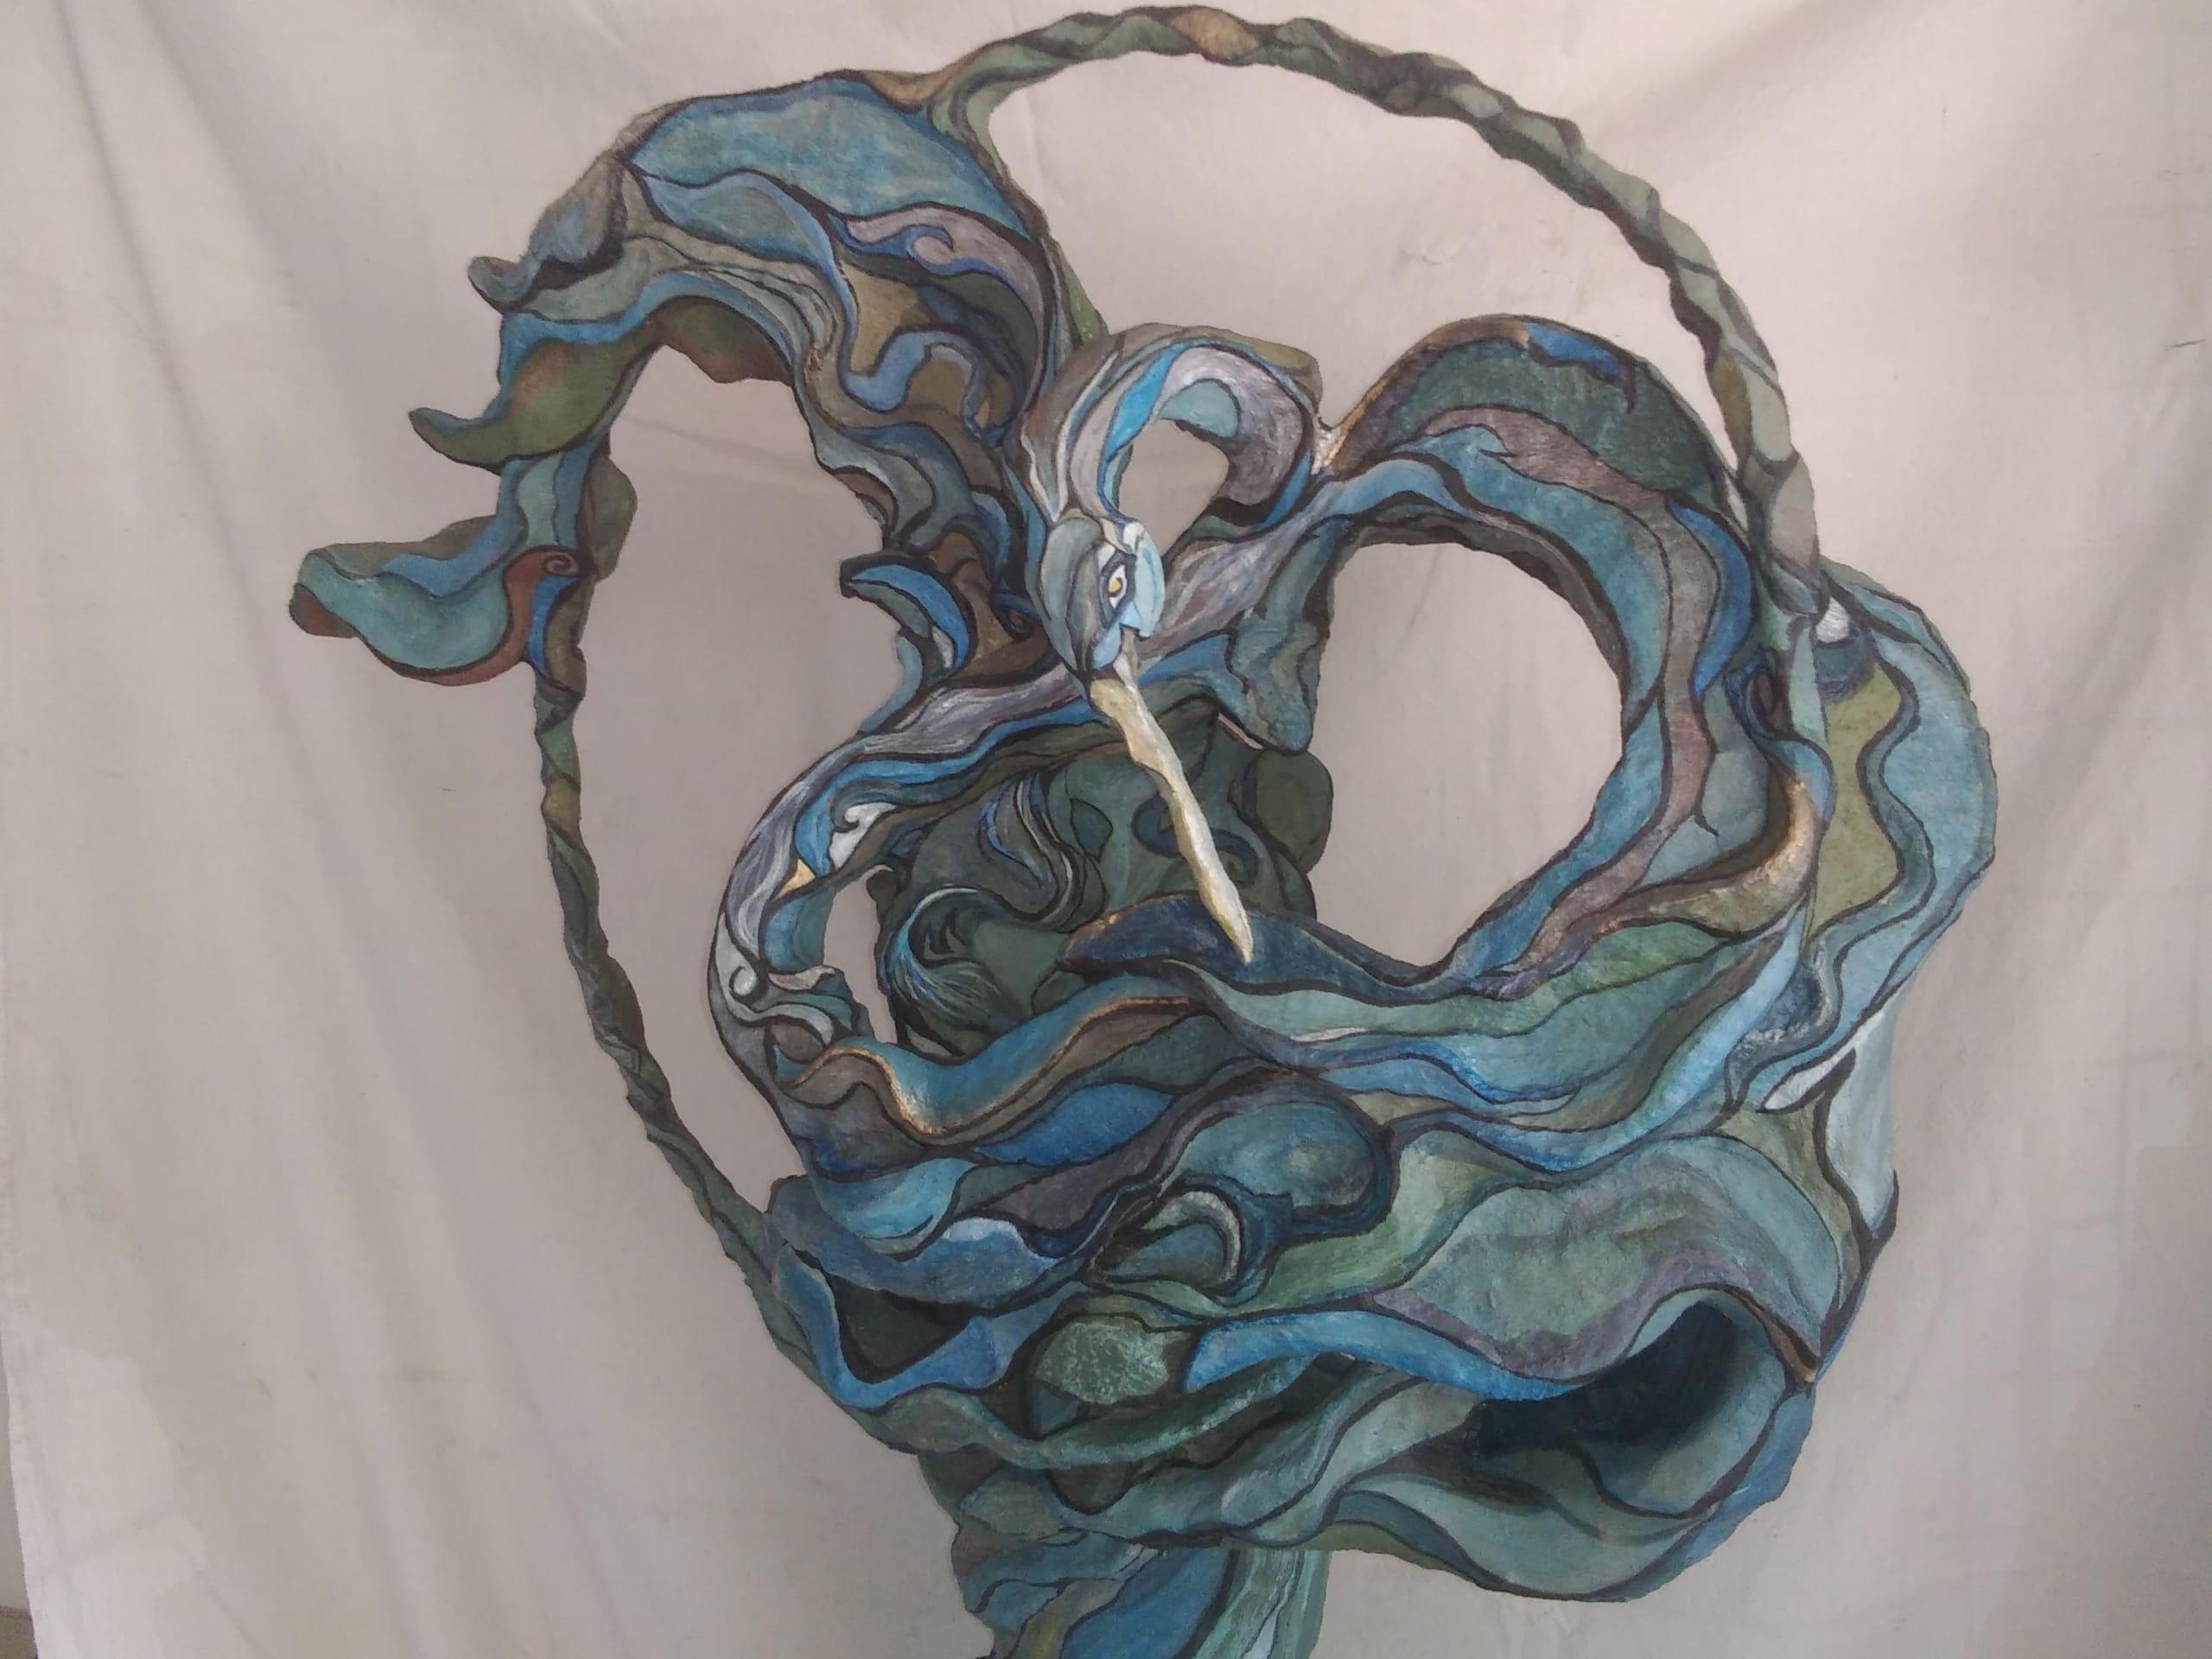 Hera – The Blue Heron